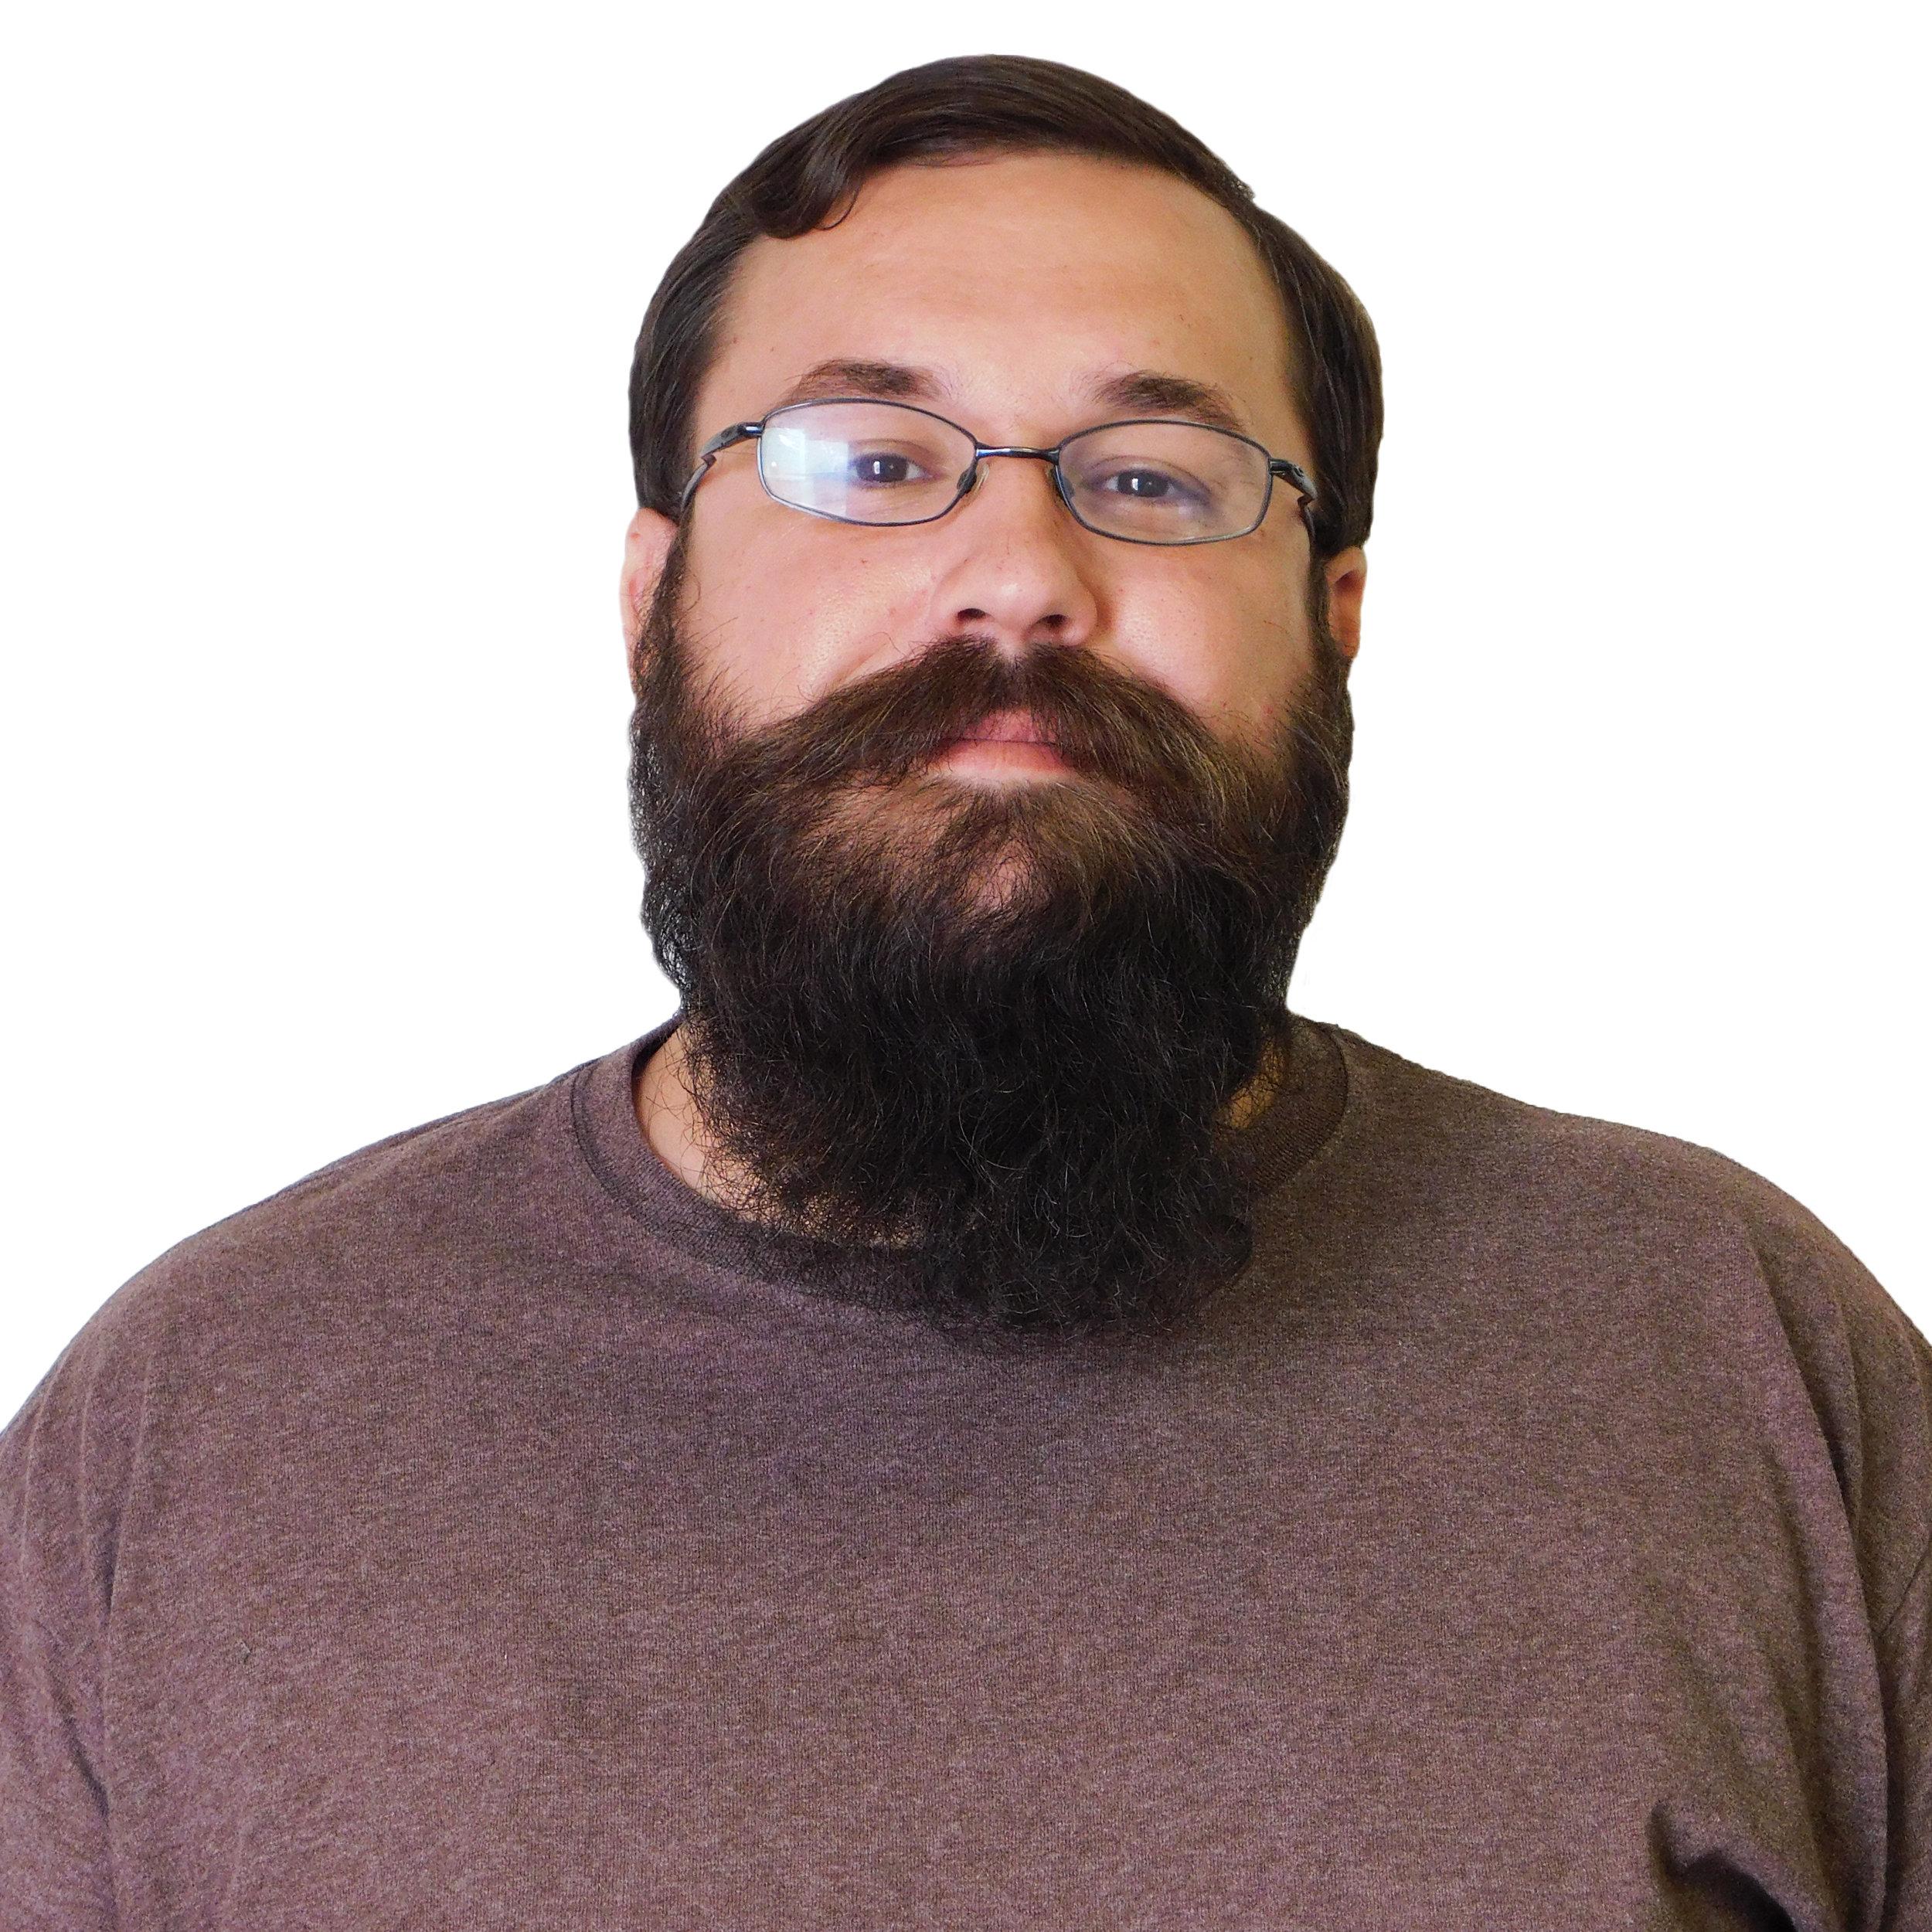 BRandon k rodebaugh  assistant engineer / materials engineer qa/qc manager